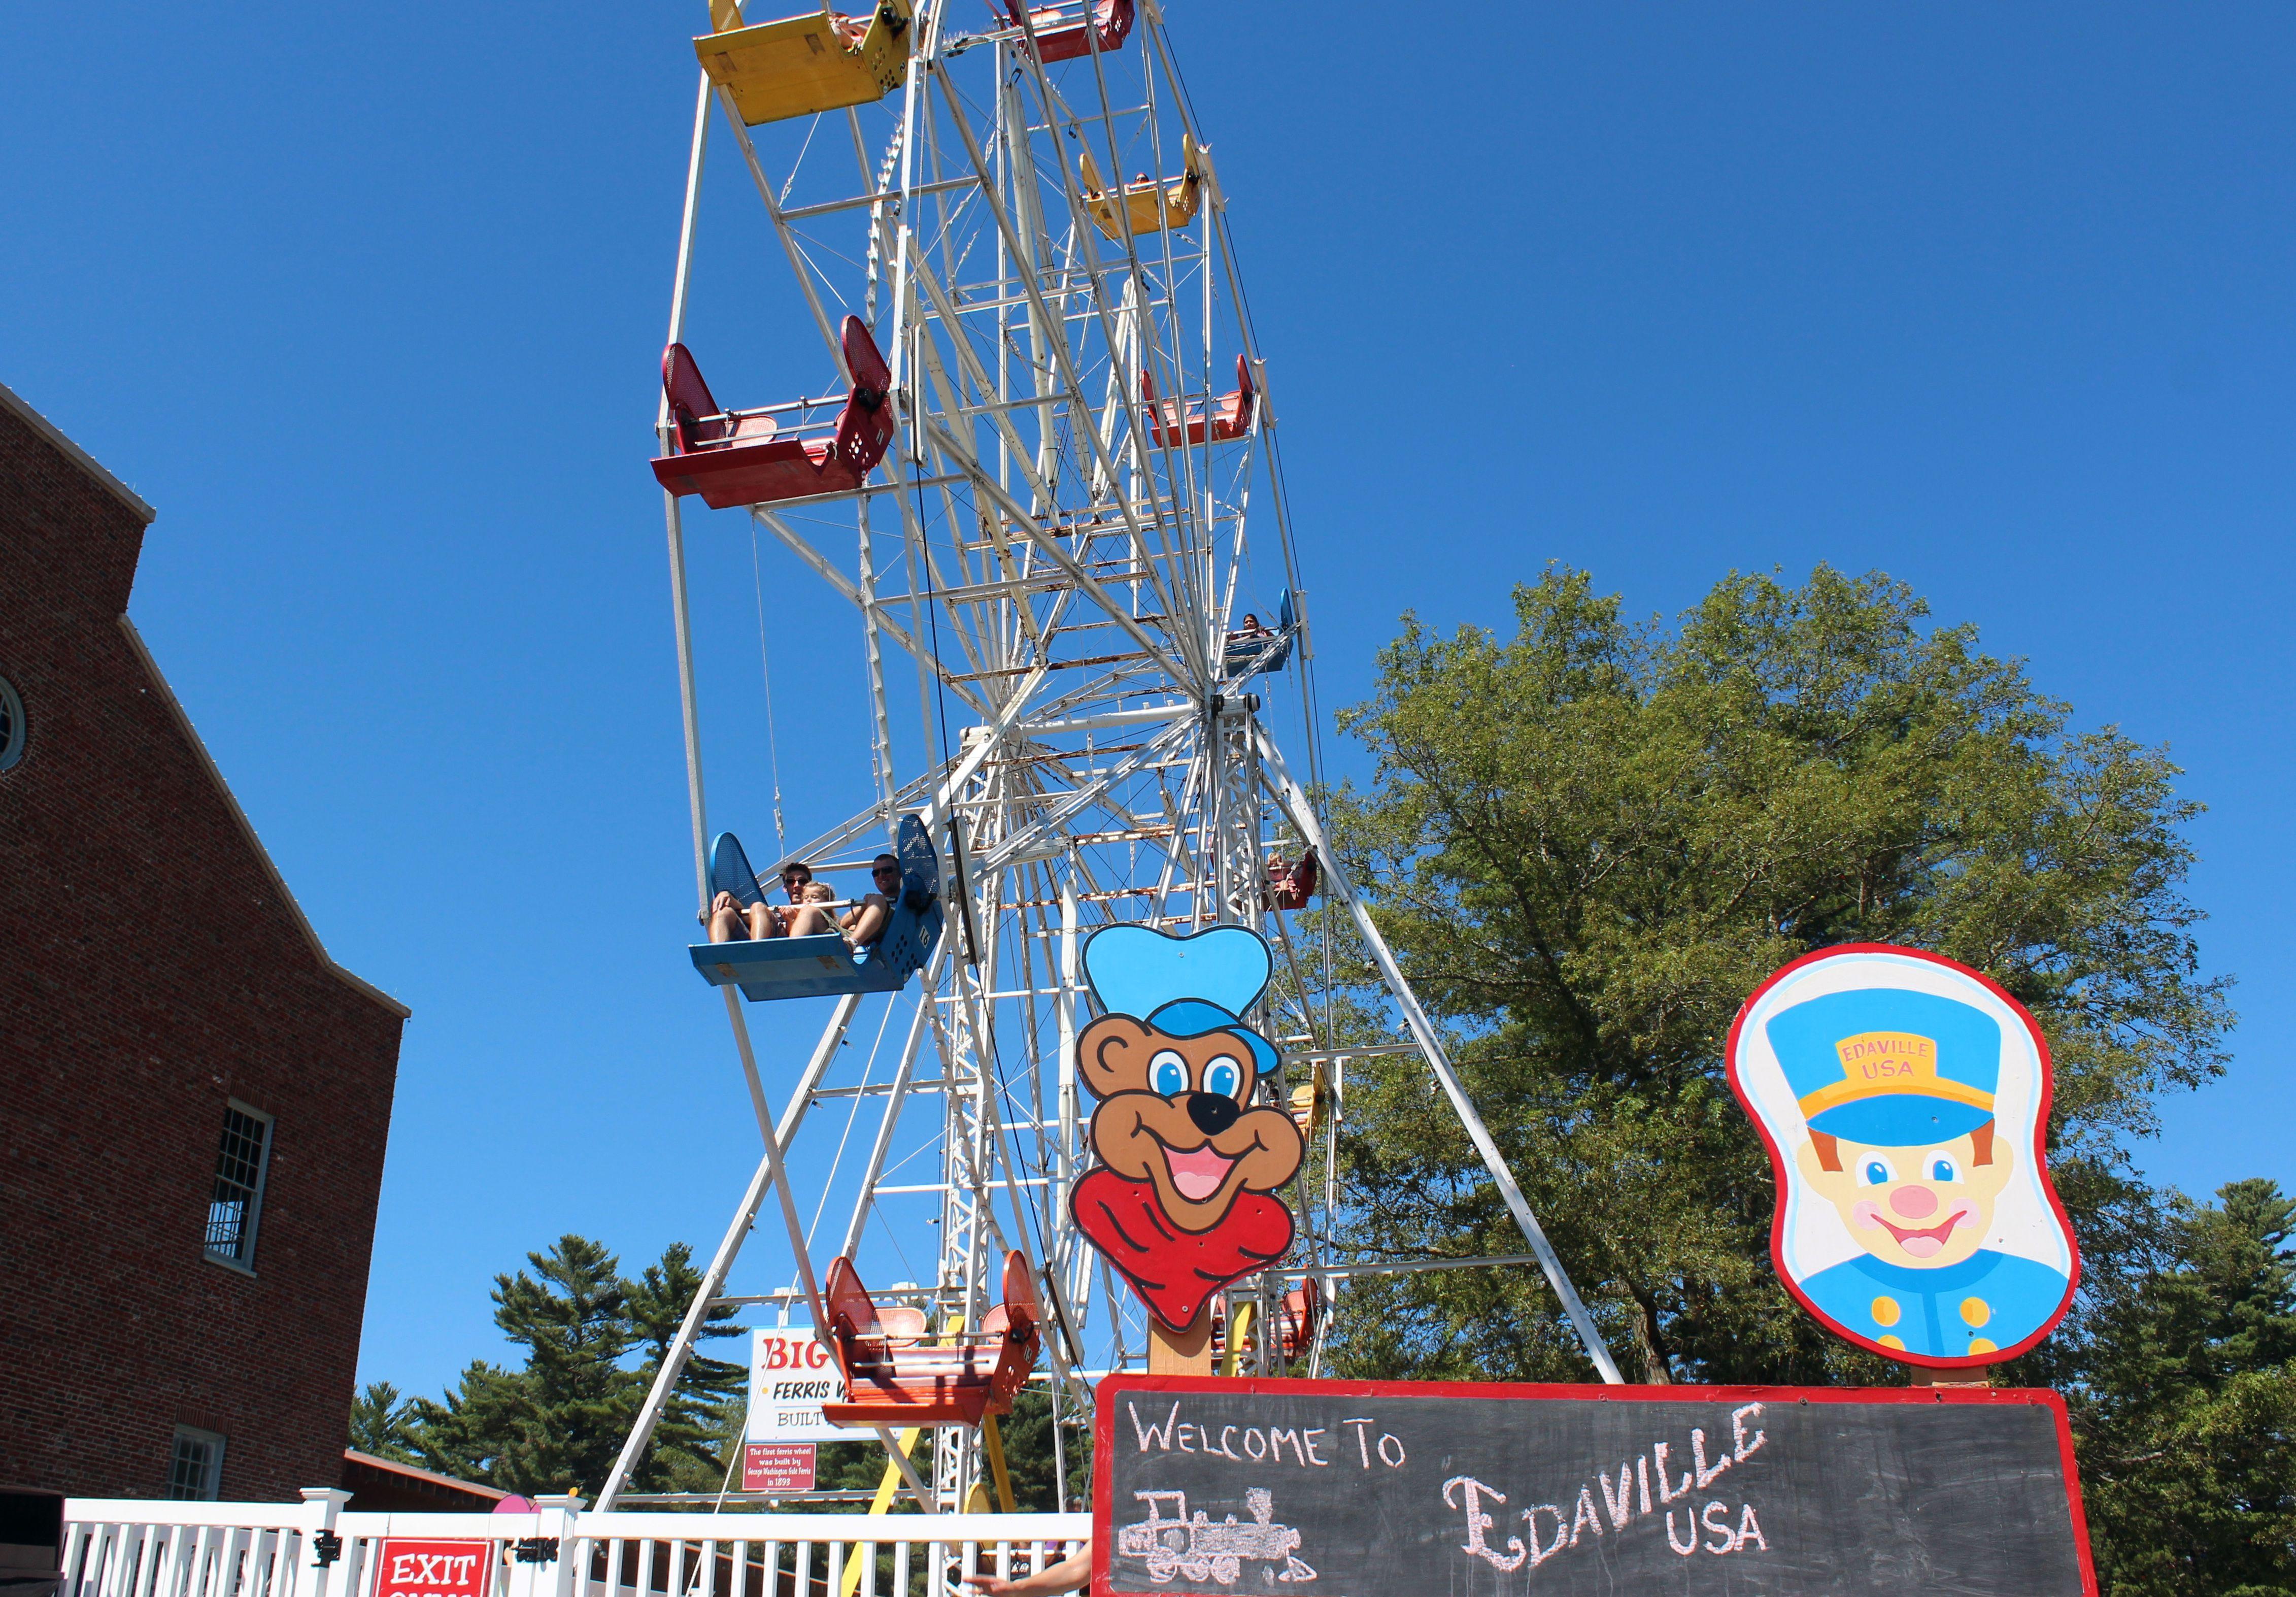 Ferris wheel at Edaville U.S.A.